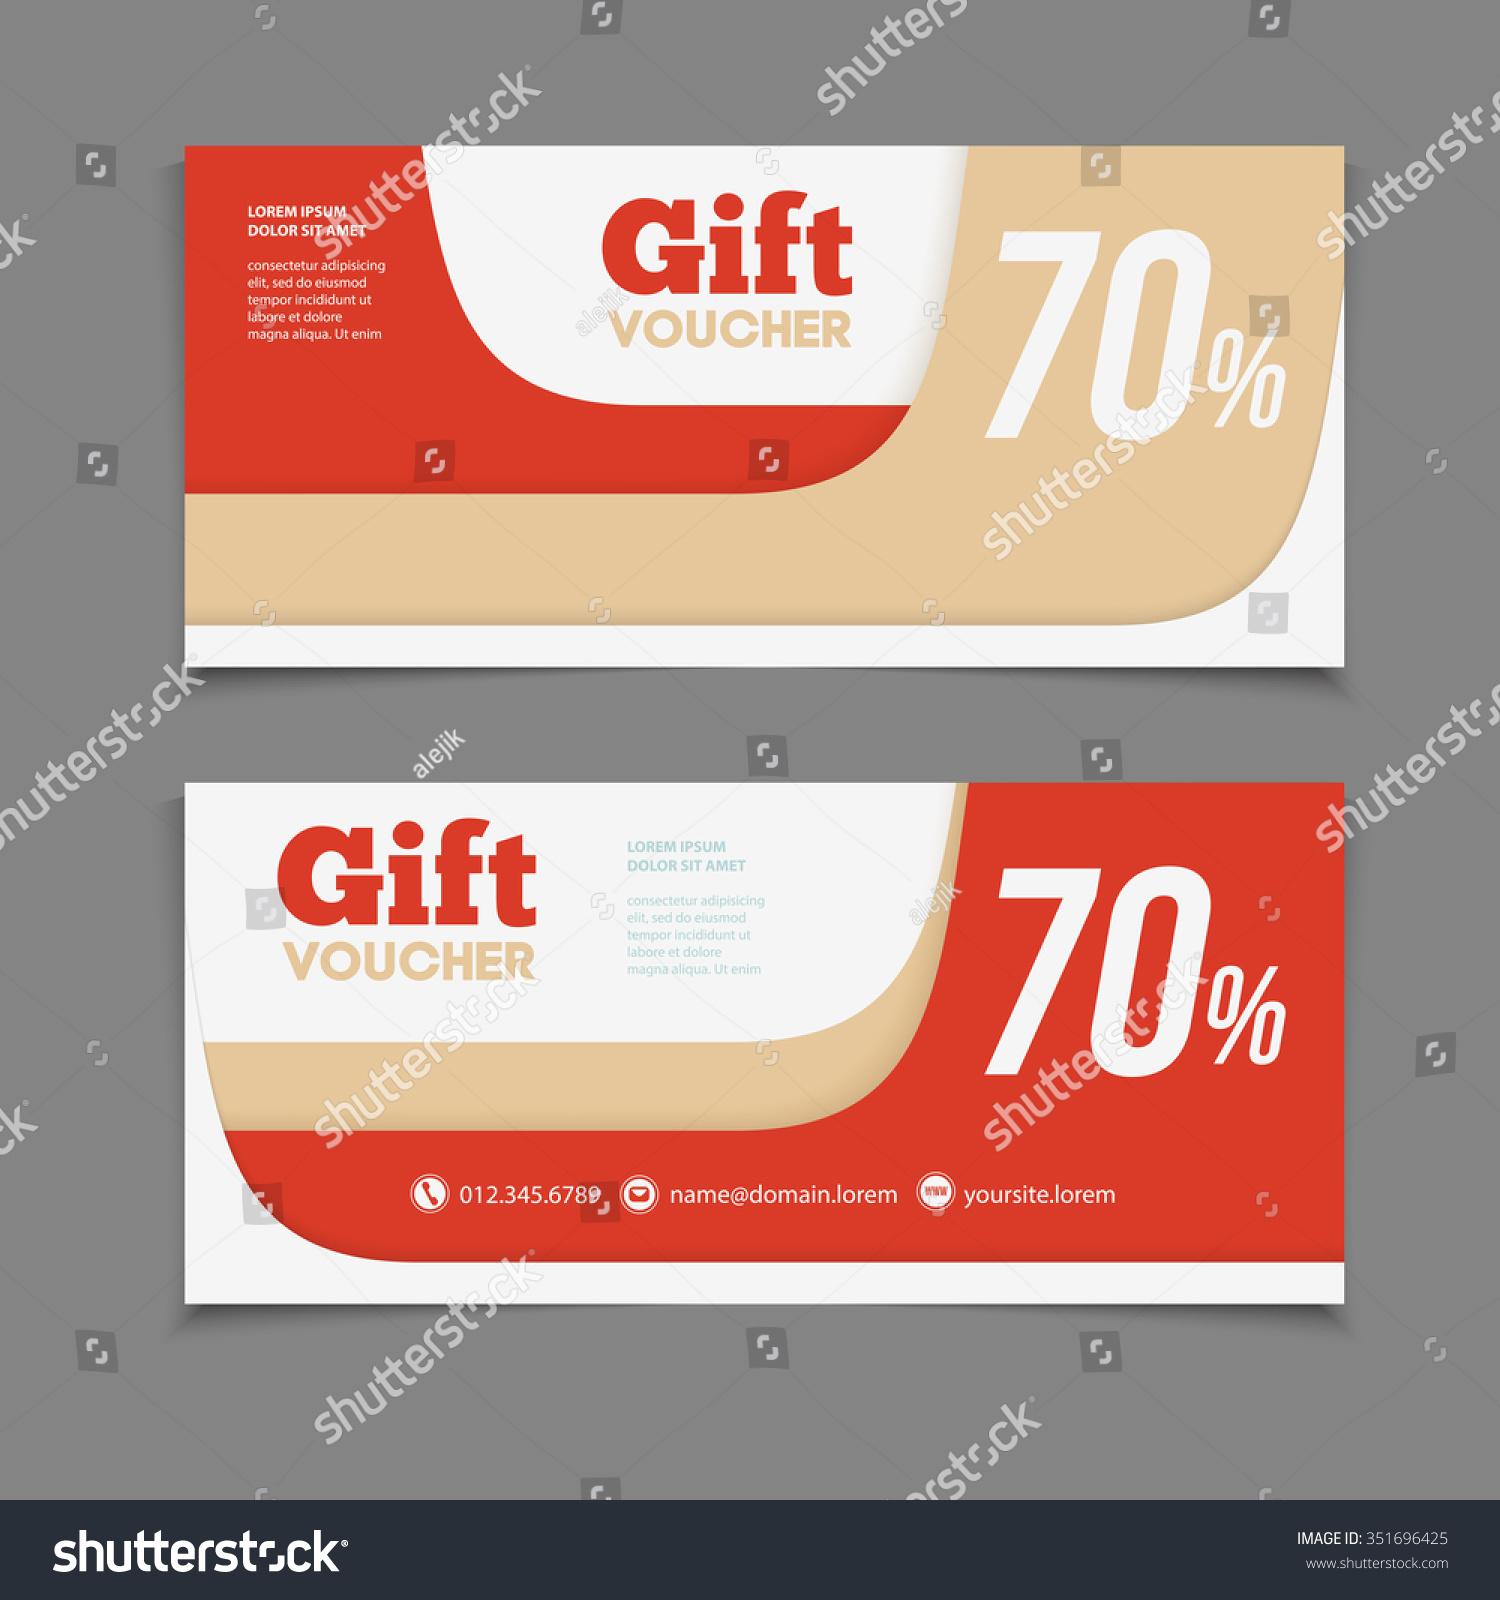 Two Coupon Voucher Design Gift Voucher Vector 351696425 – Discount Voucher Design